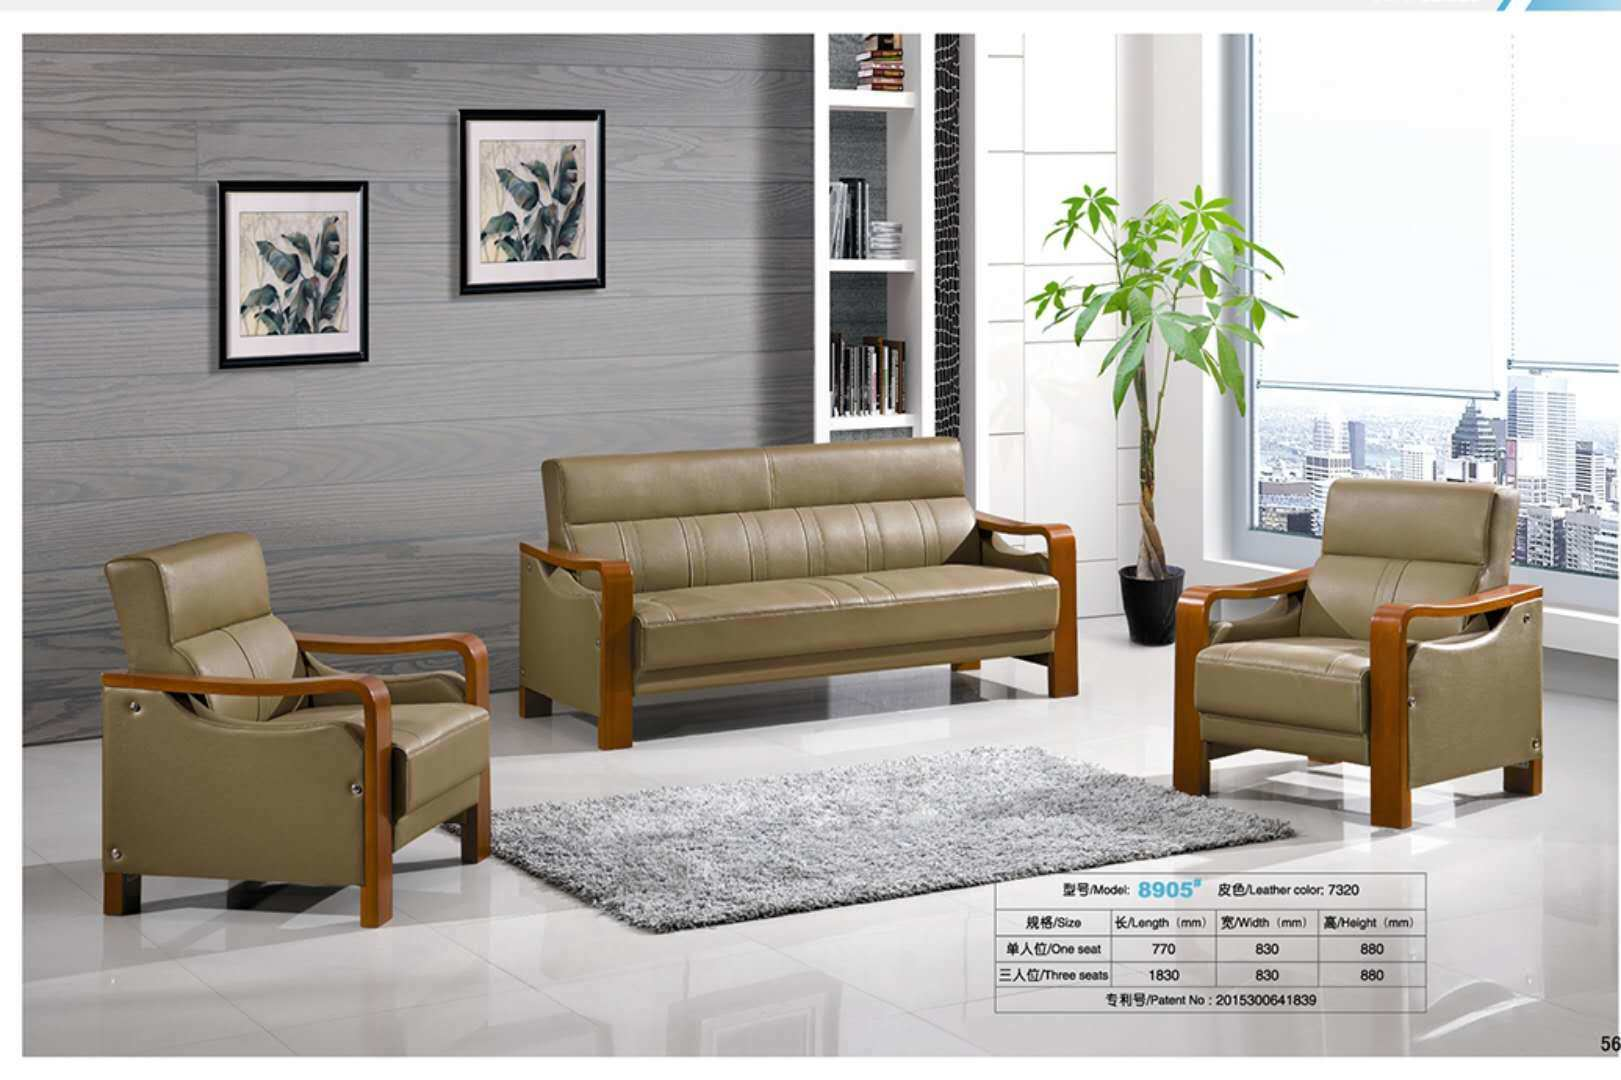 Clical Modern Design Wooden Armrest